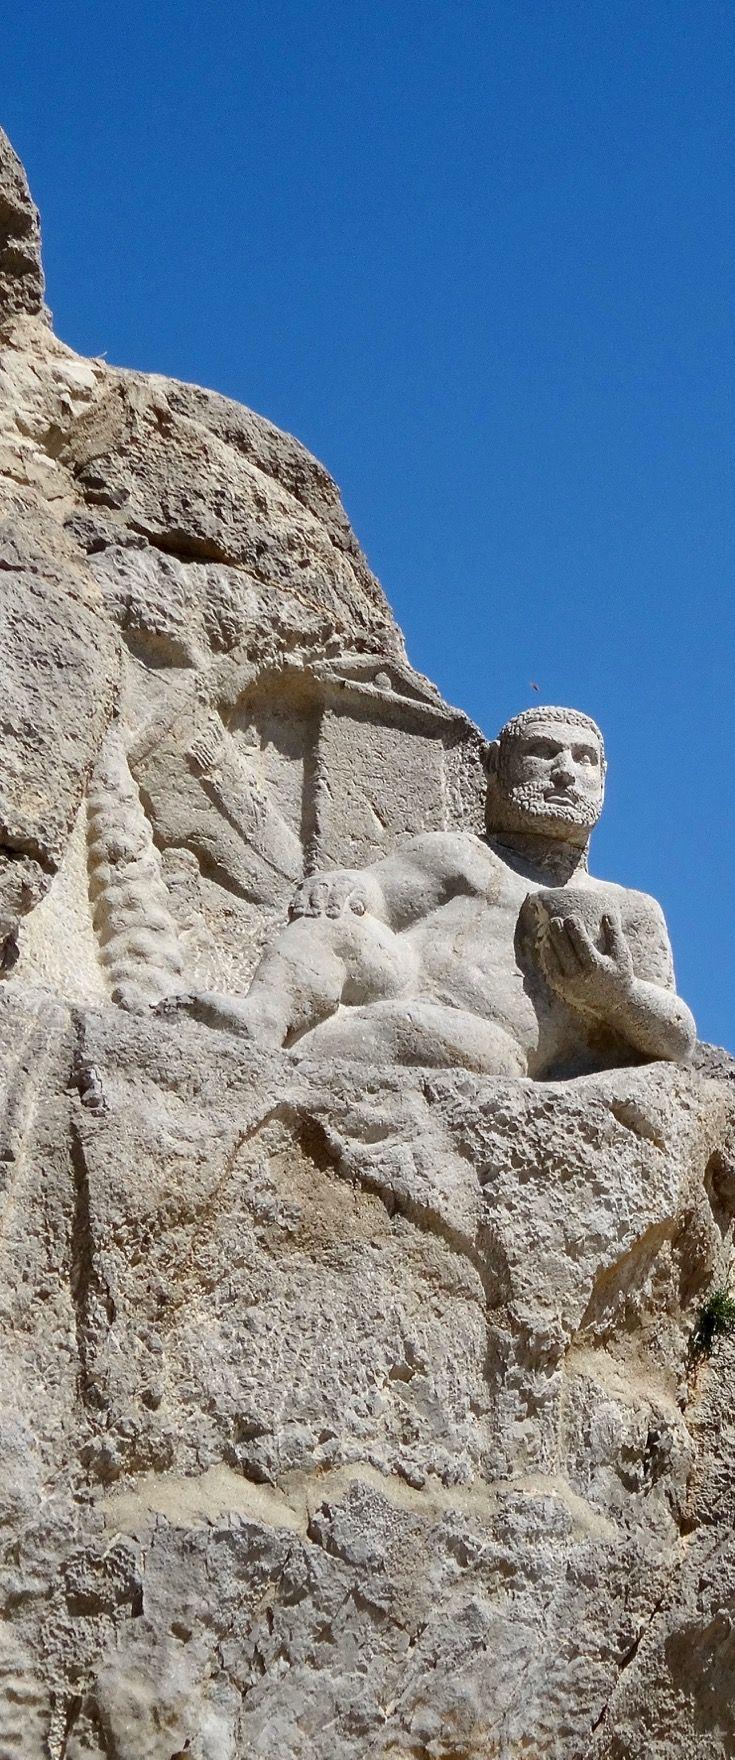 Seleucid Statue of Herakles, Bisotun, Iran